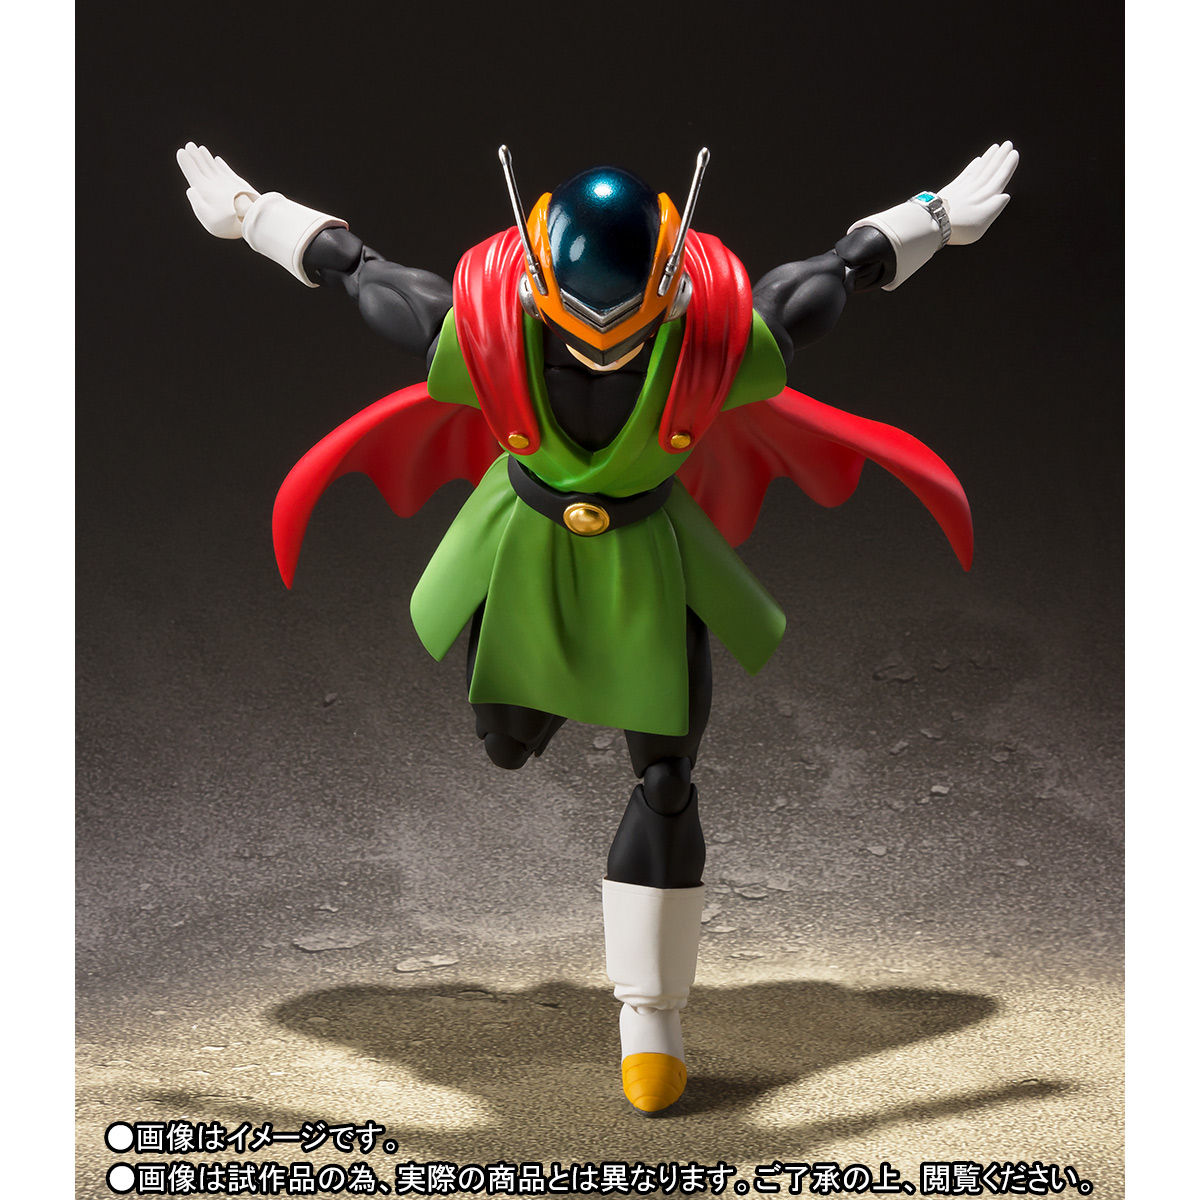 S.H.フィギュアーツ『グレートサイヤマン』ドラゴンボールZ 可動フィギュア-004